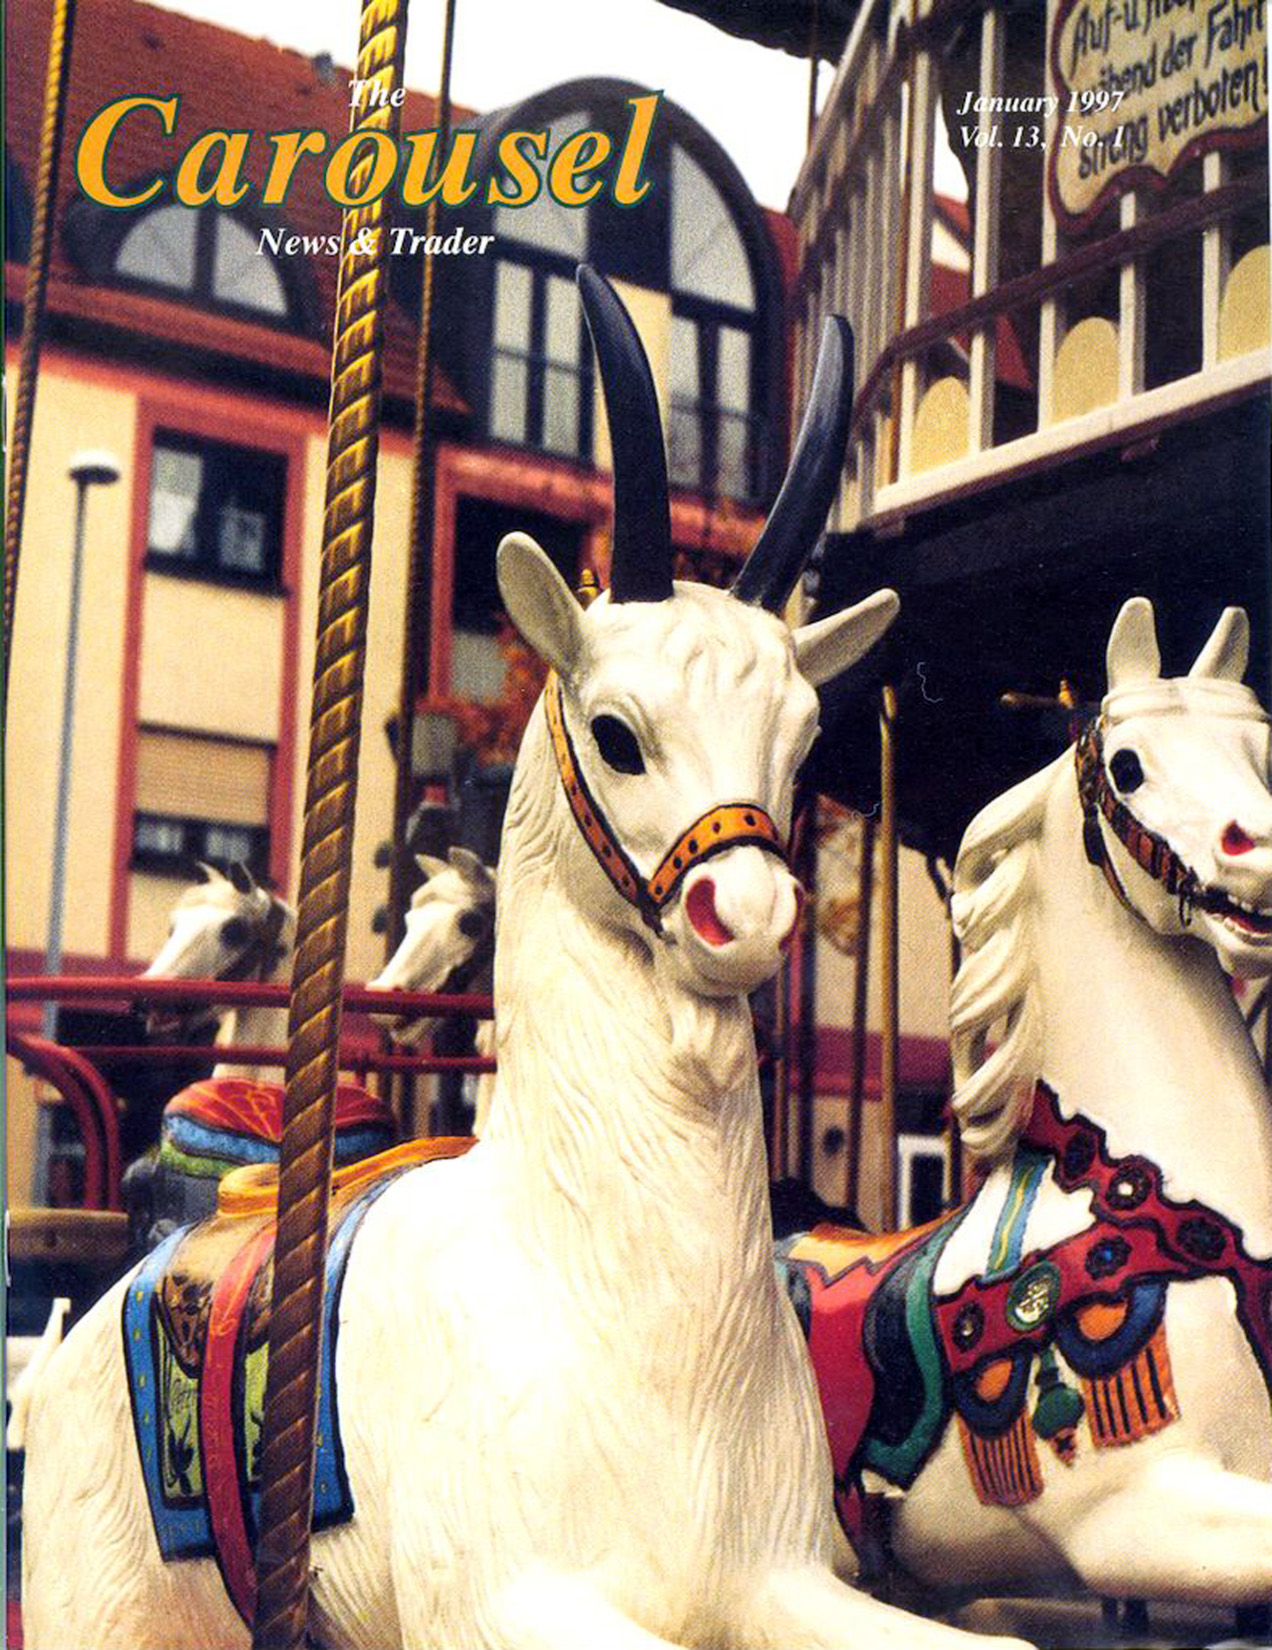 cnt_01_1997-Ca-1884-Karl-Muller-Frederick-Heyn-carousel